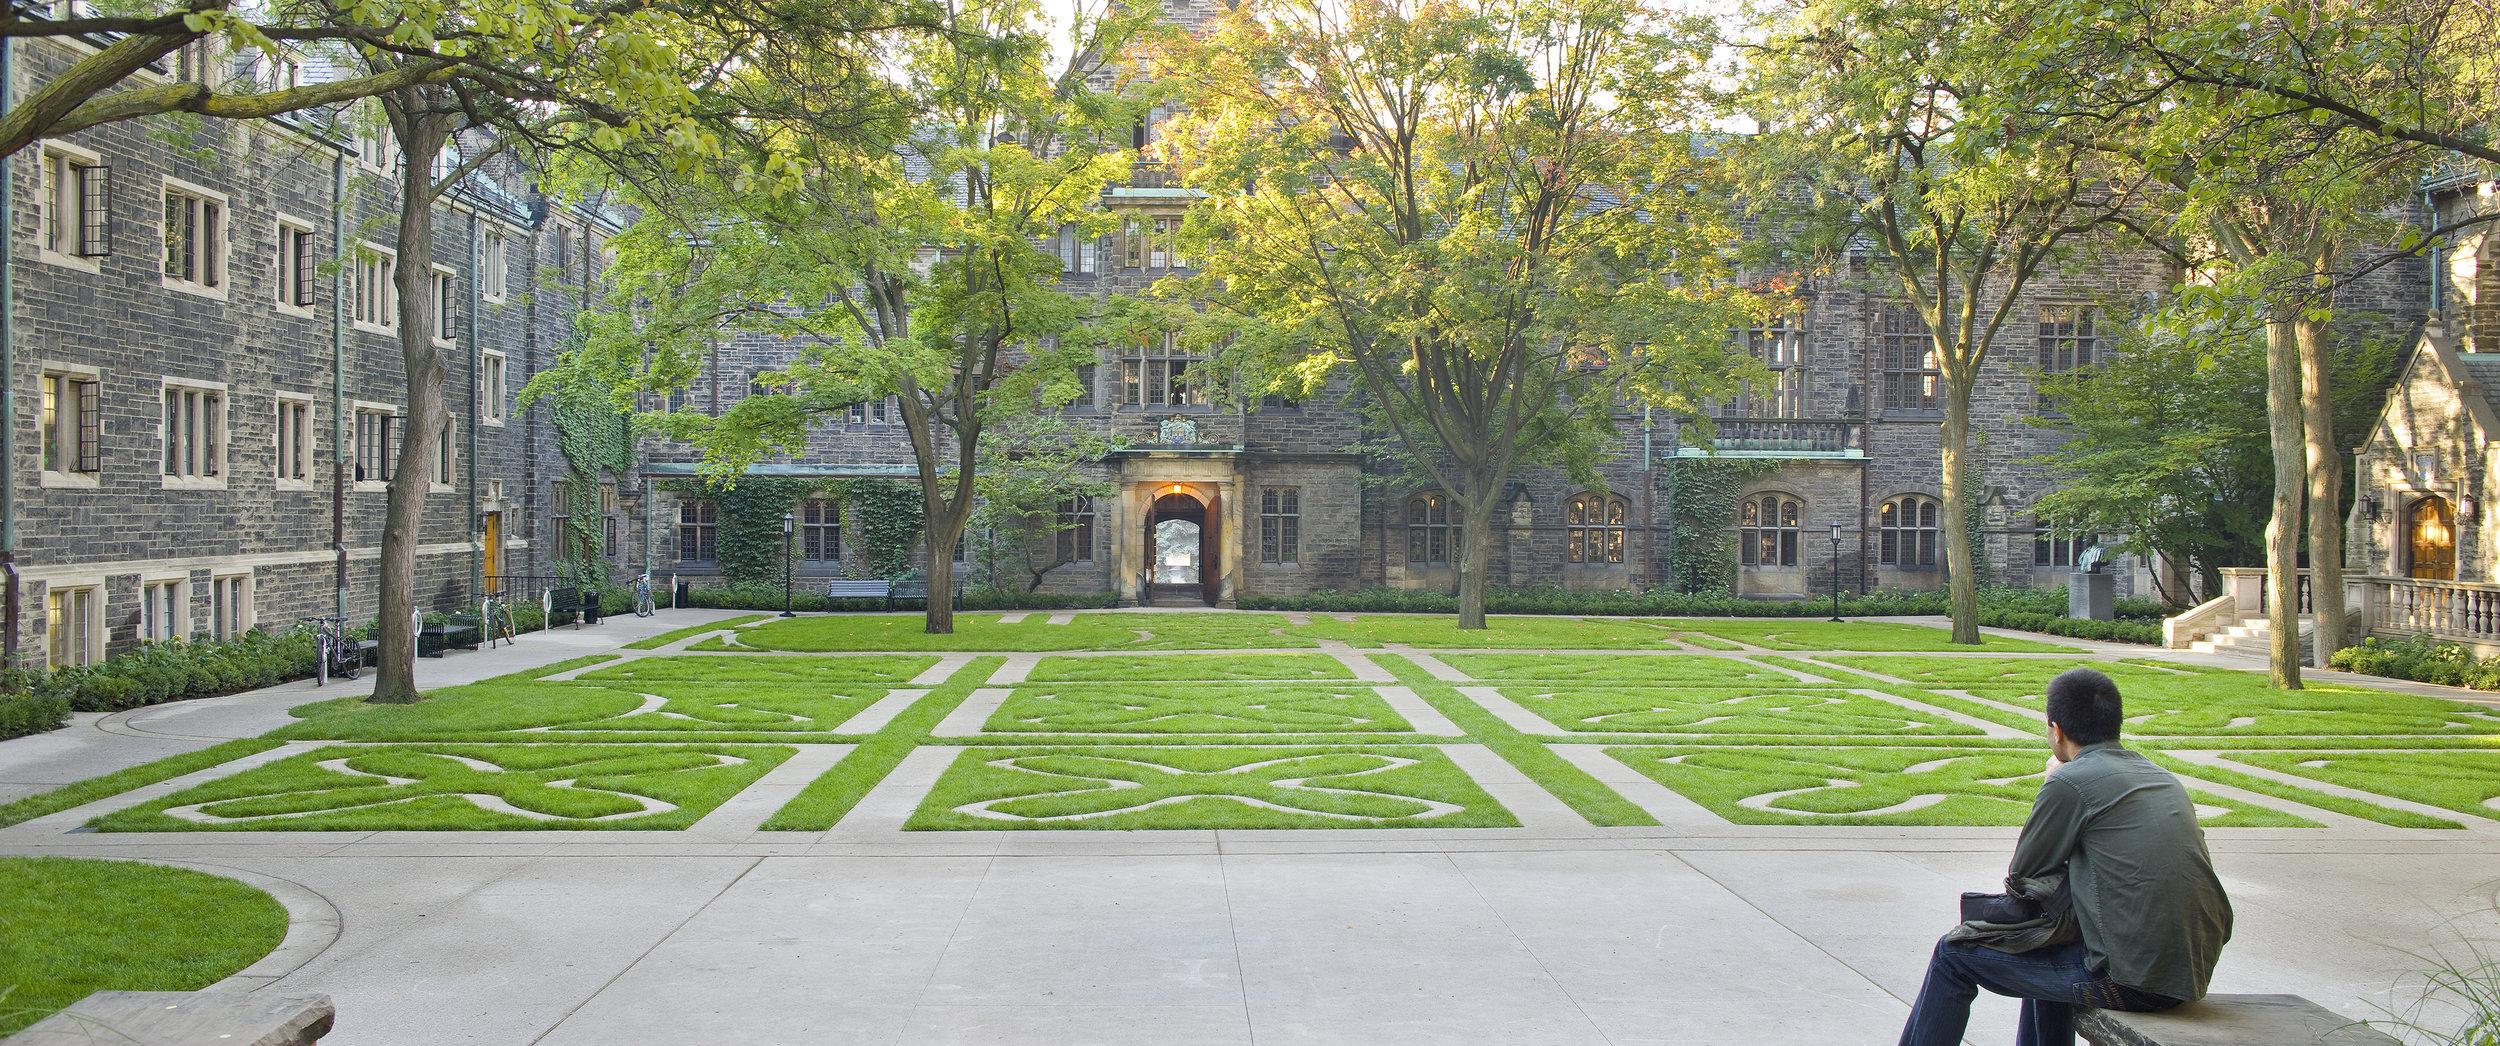 Trinity College Quadrangle -